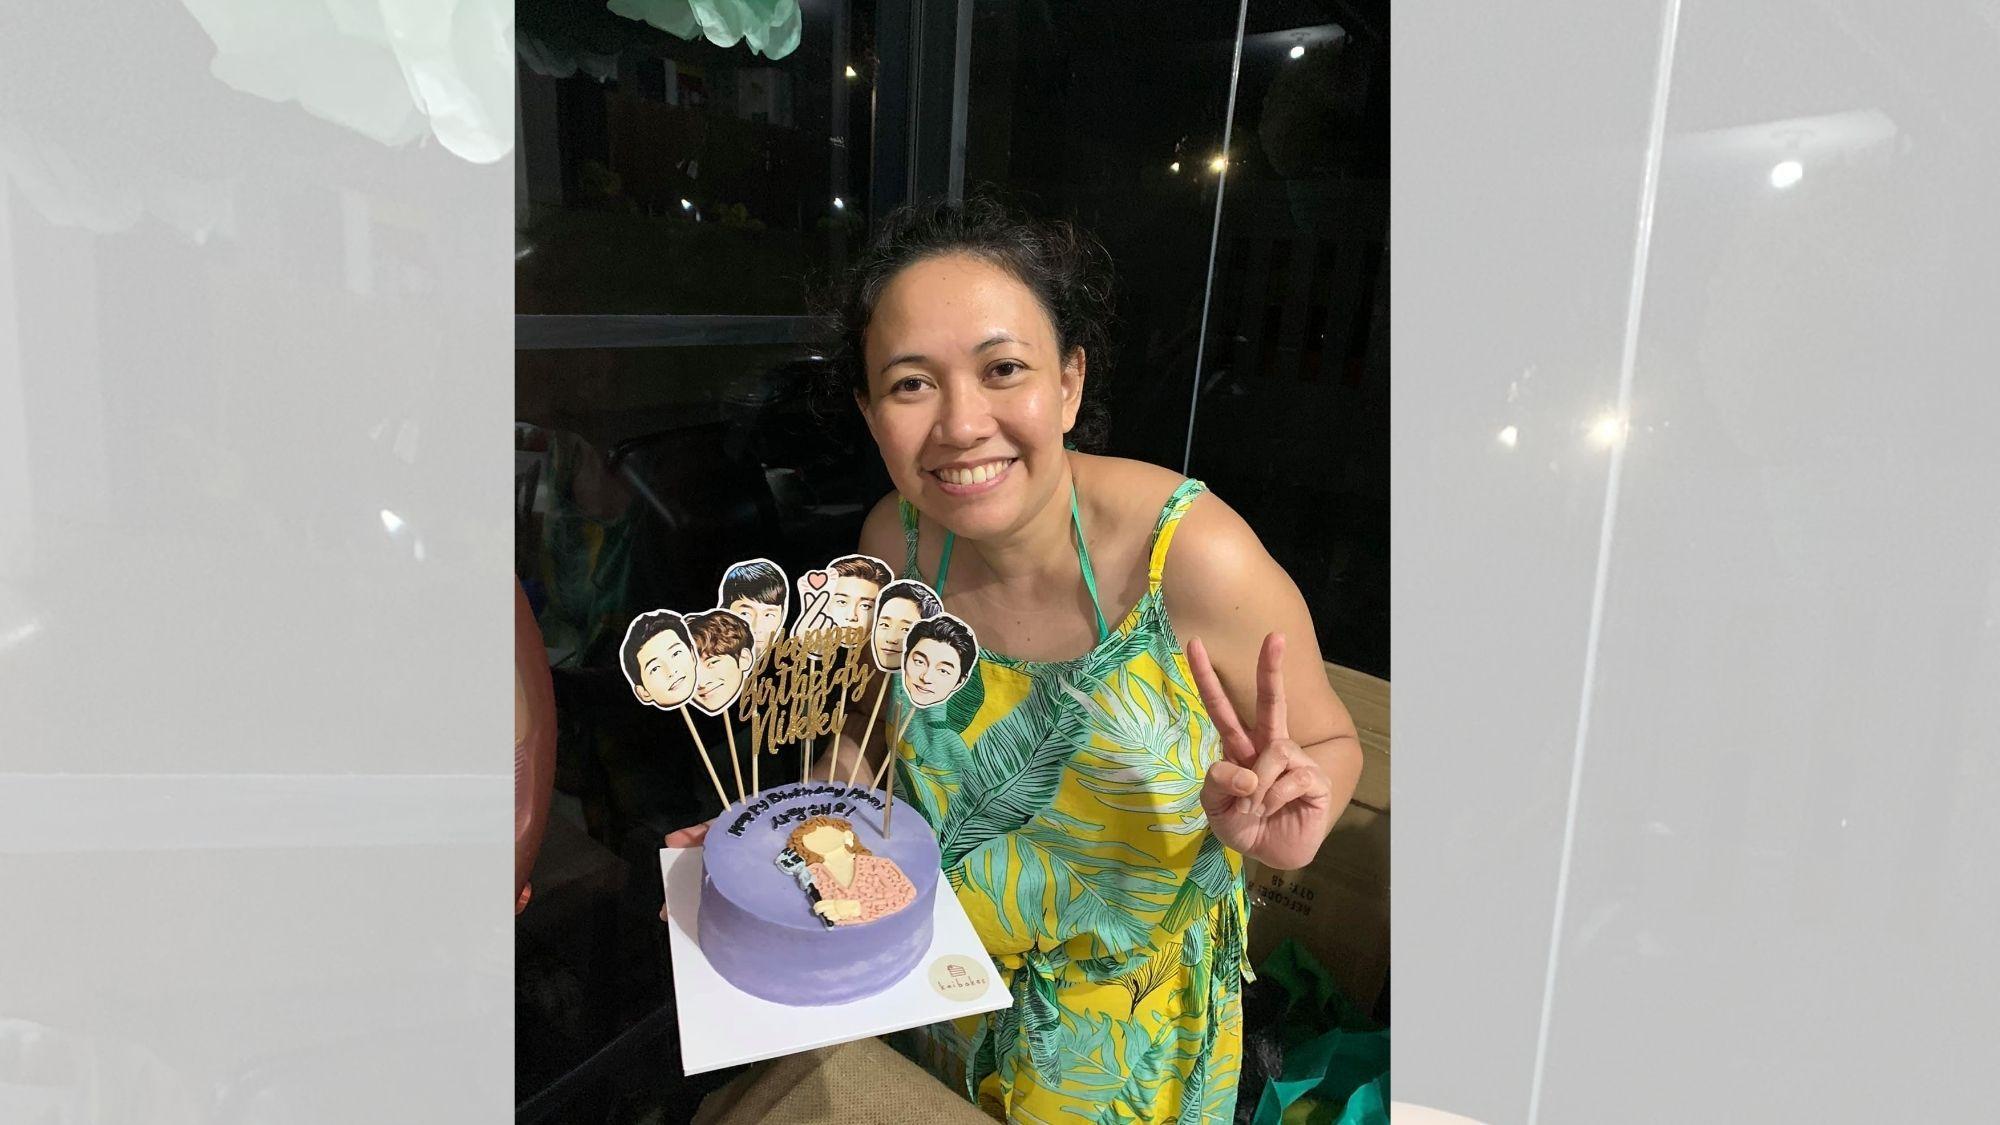 Singer and music mentor Nikki Junia of San Pedro celebrates natal day with virtual K-pop idols